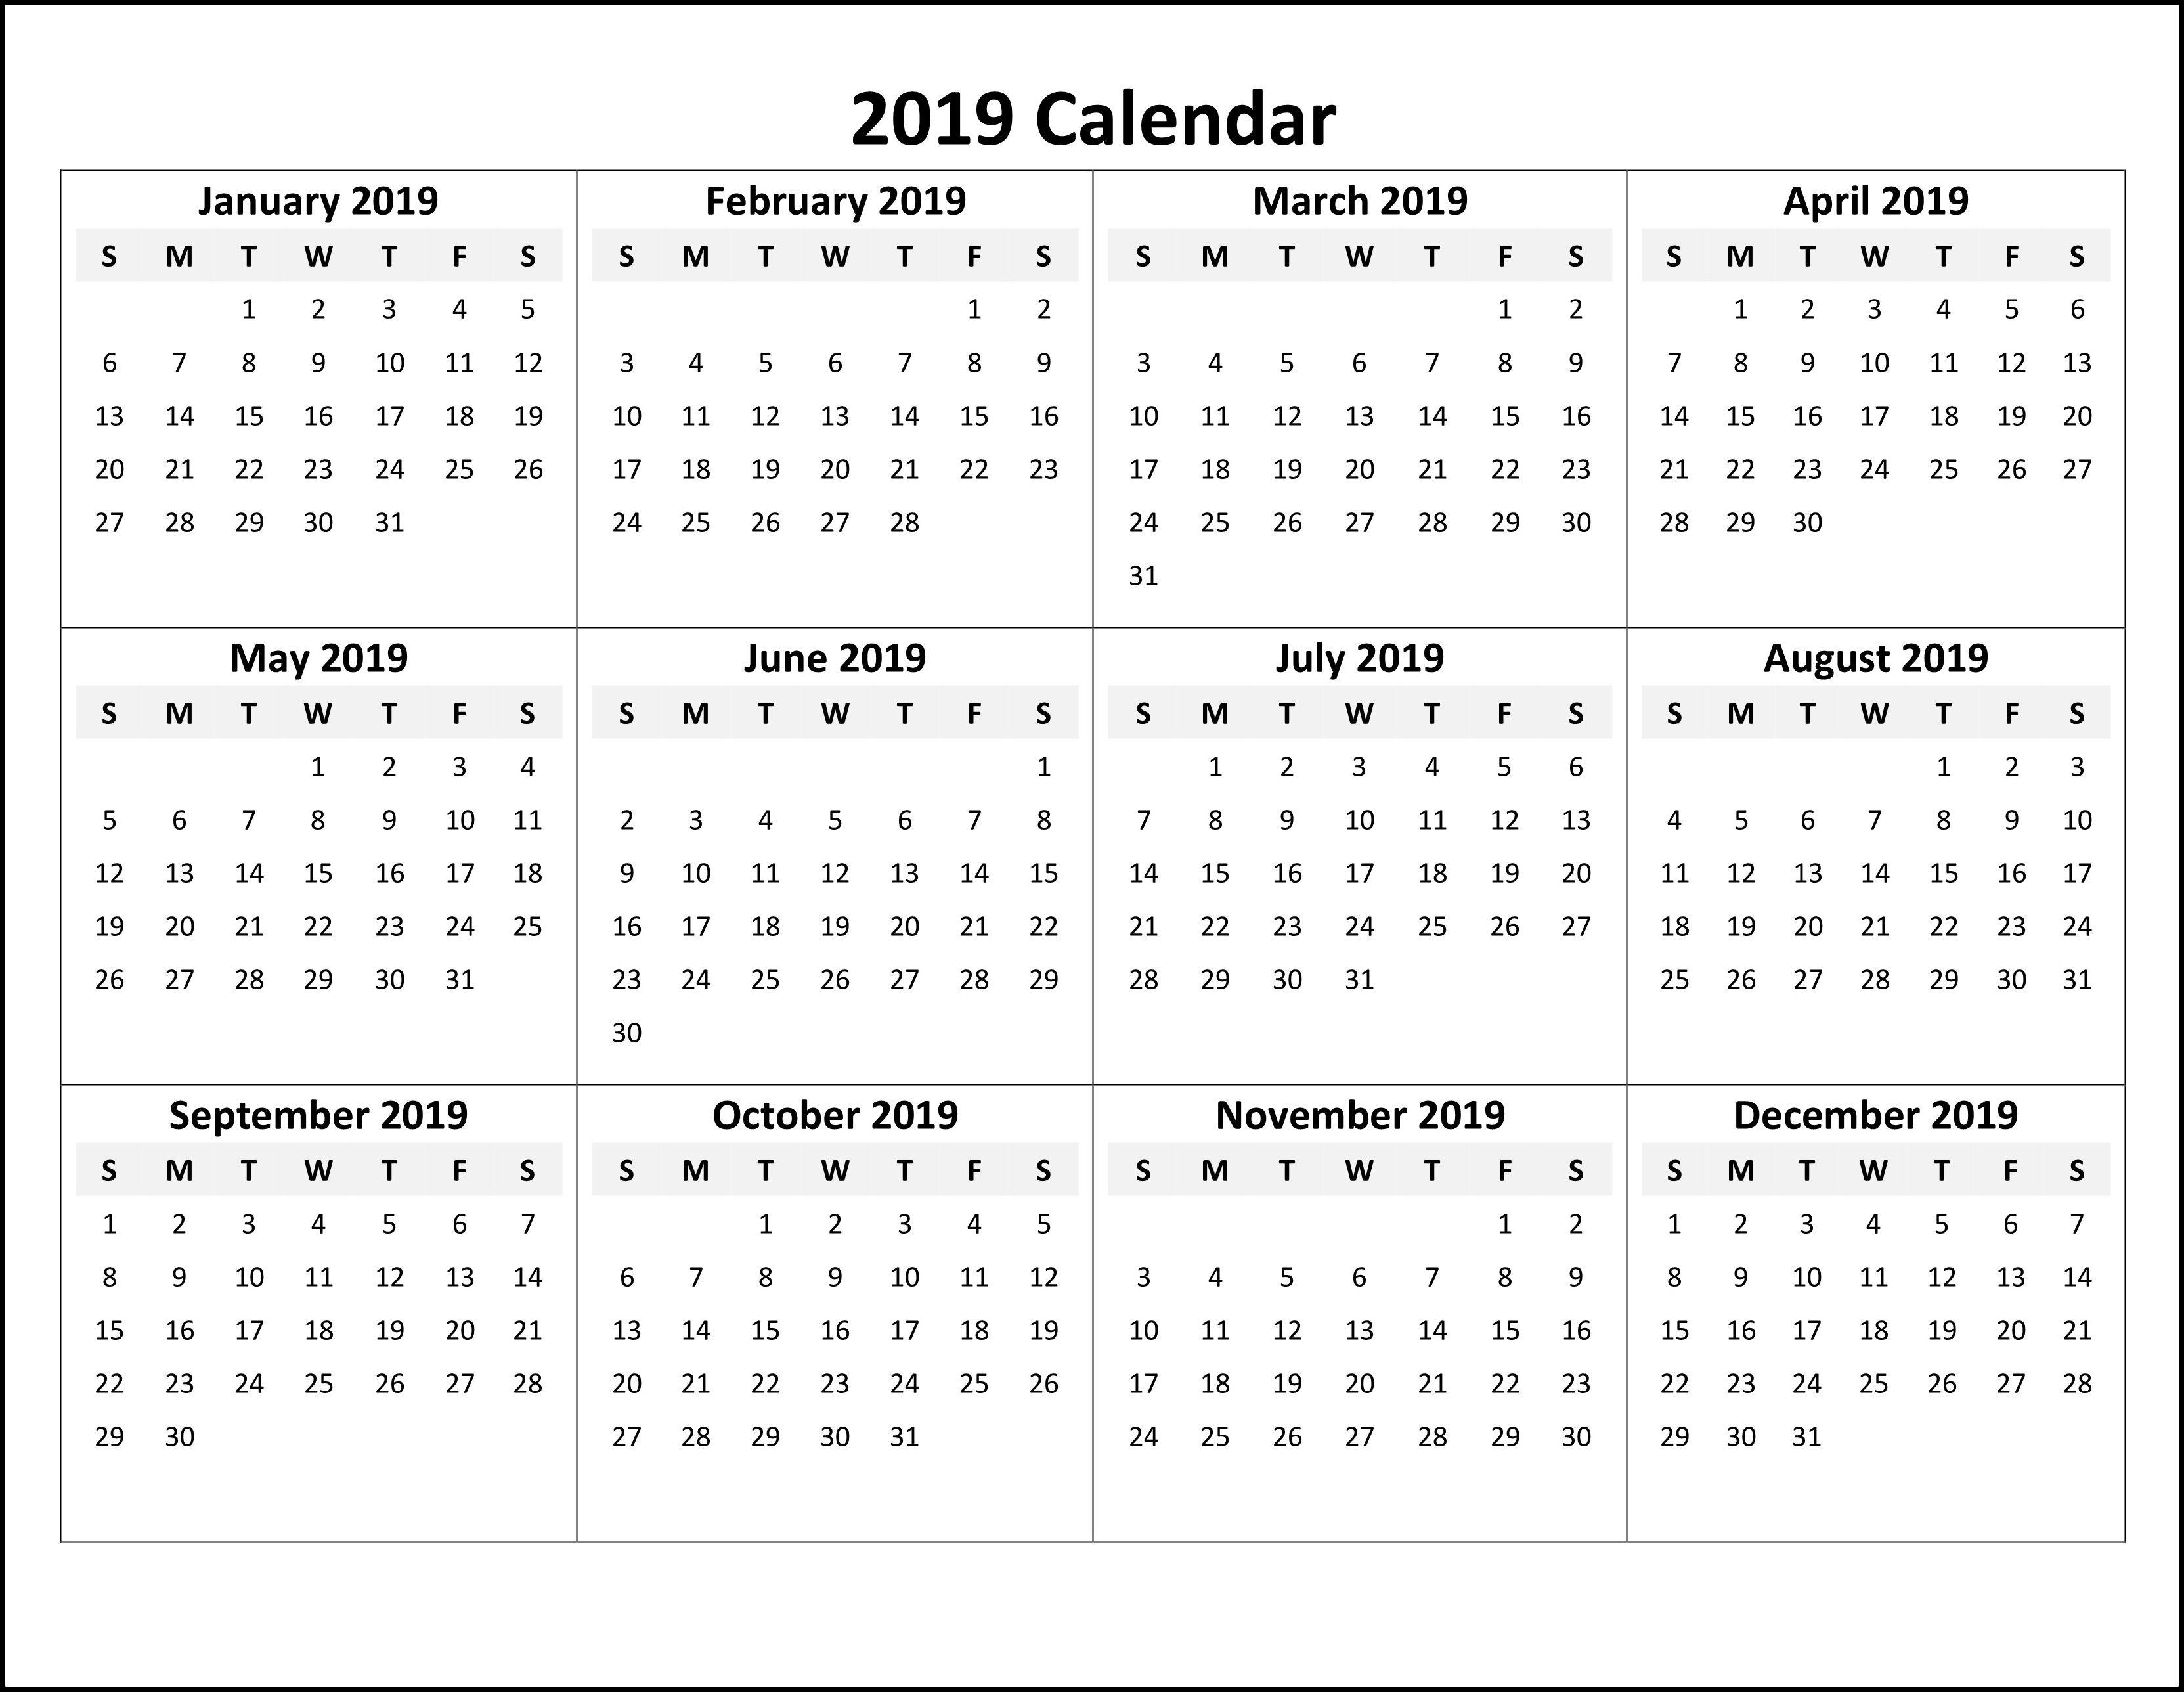 Online Calendar Template 2019 Online Printable Calendar 2019 #calendar2019